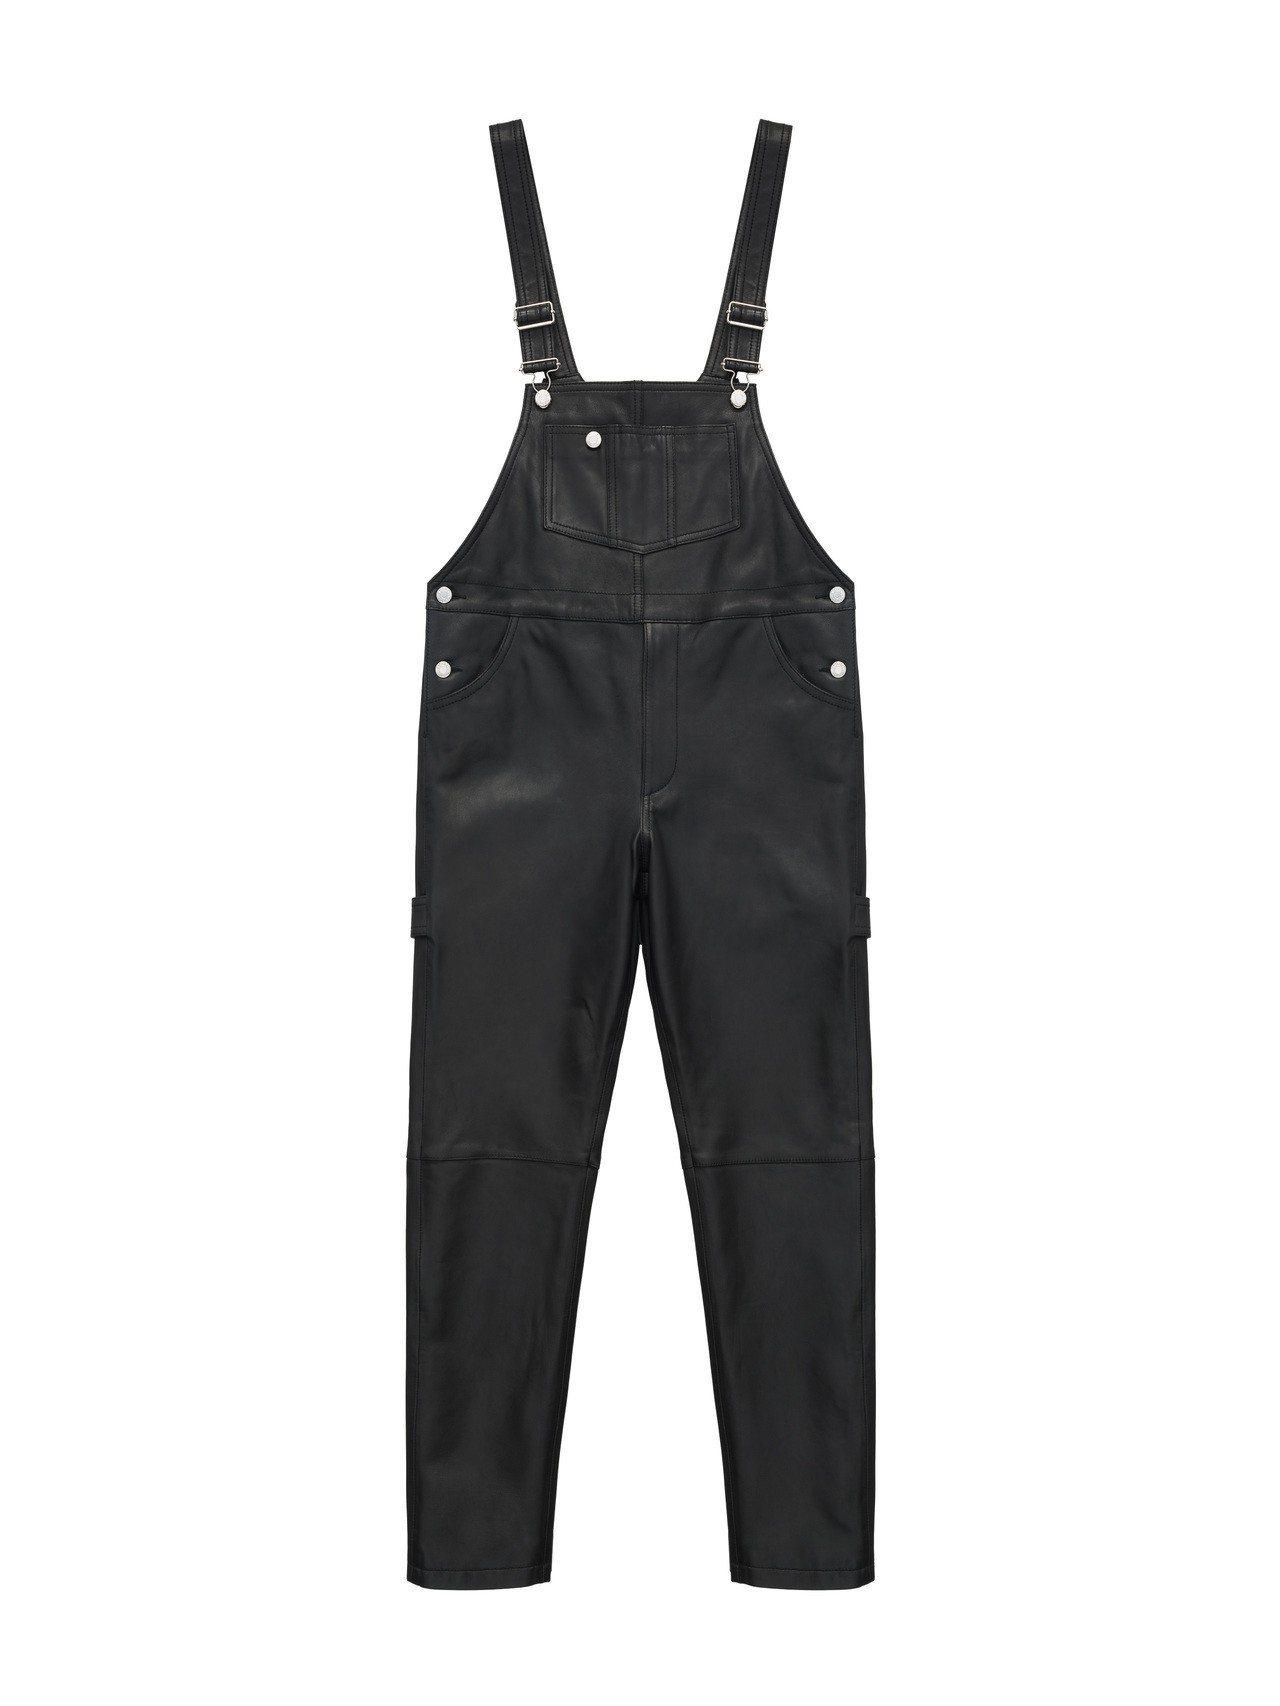 Moschino[TV] H&M系列男裝吊帶褲,4,9999元。圖/H&M提供